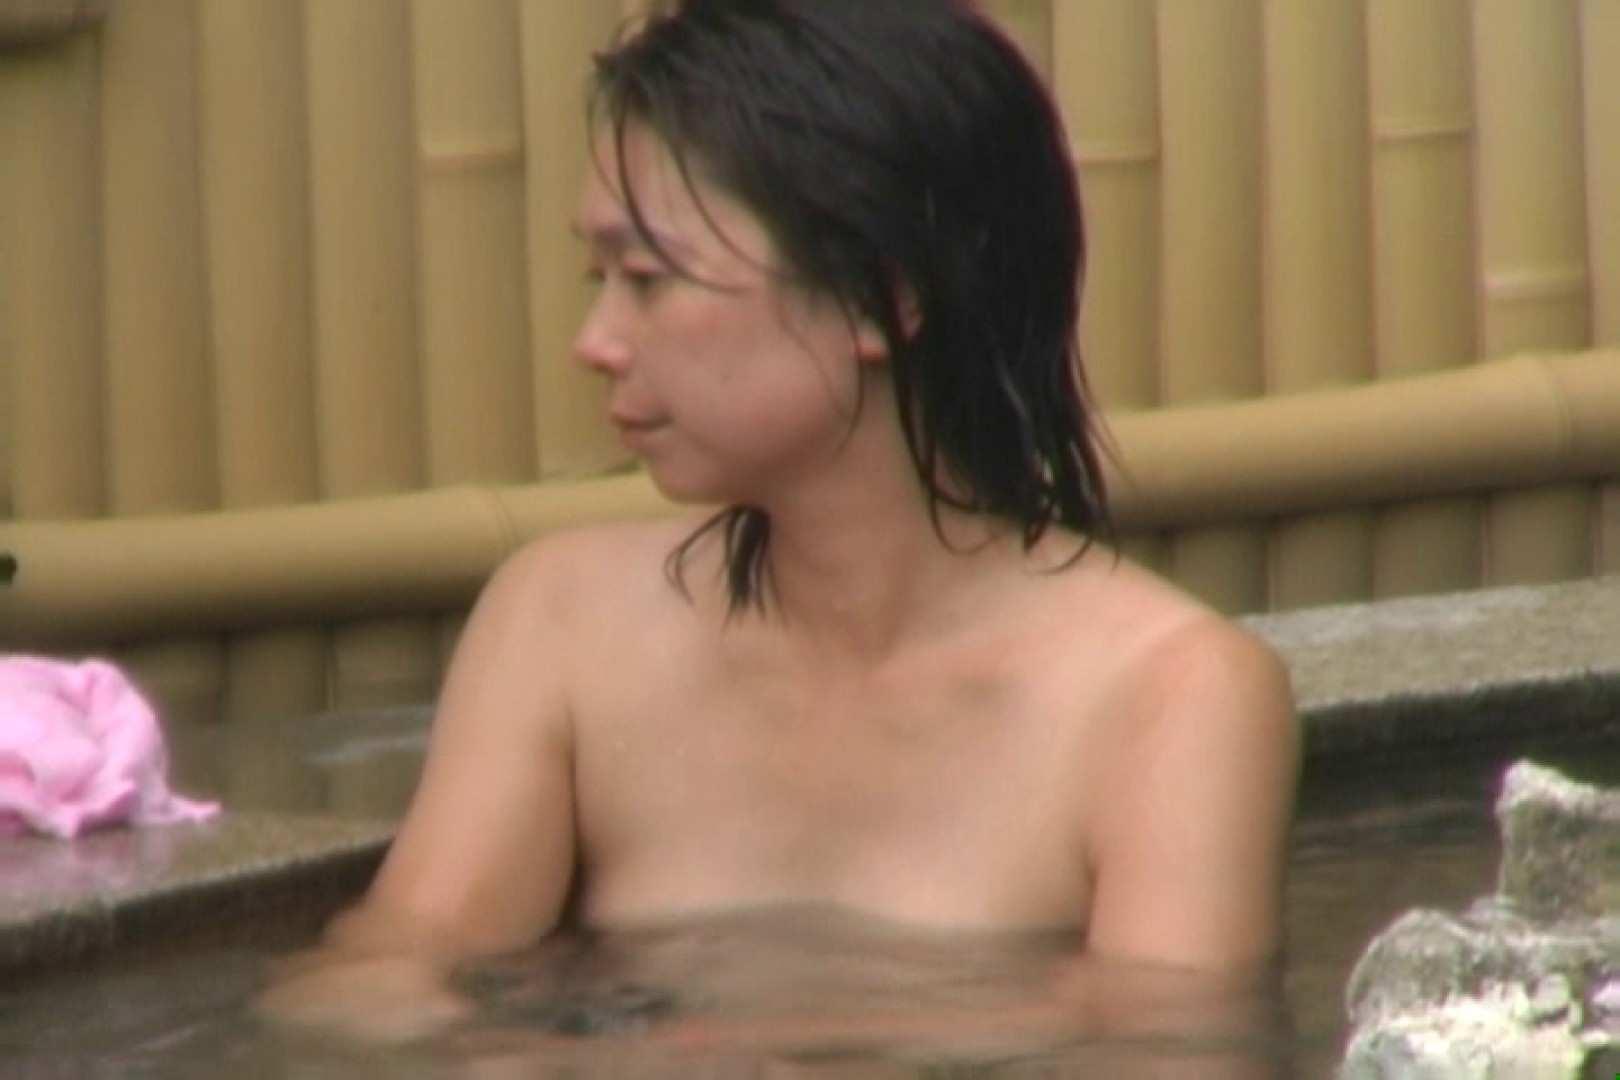 Aquaな露天風呂Vol.619 盗撮シリーズ | 露天風呂編  75PIX 61